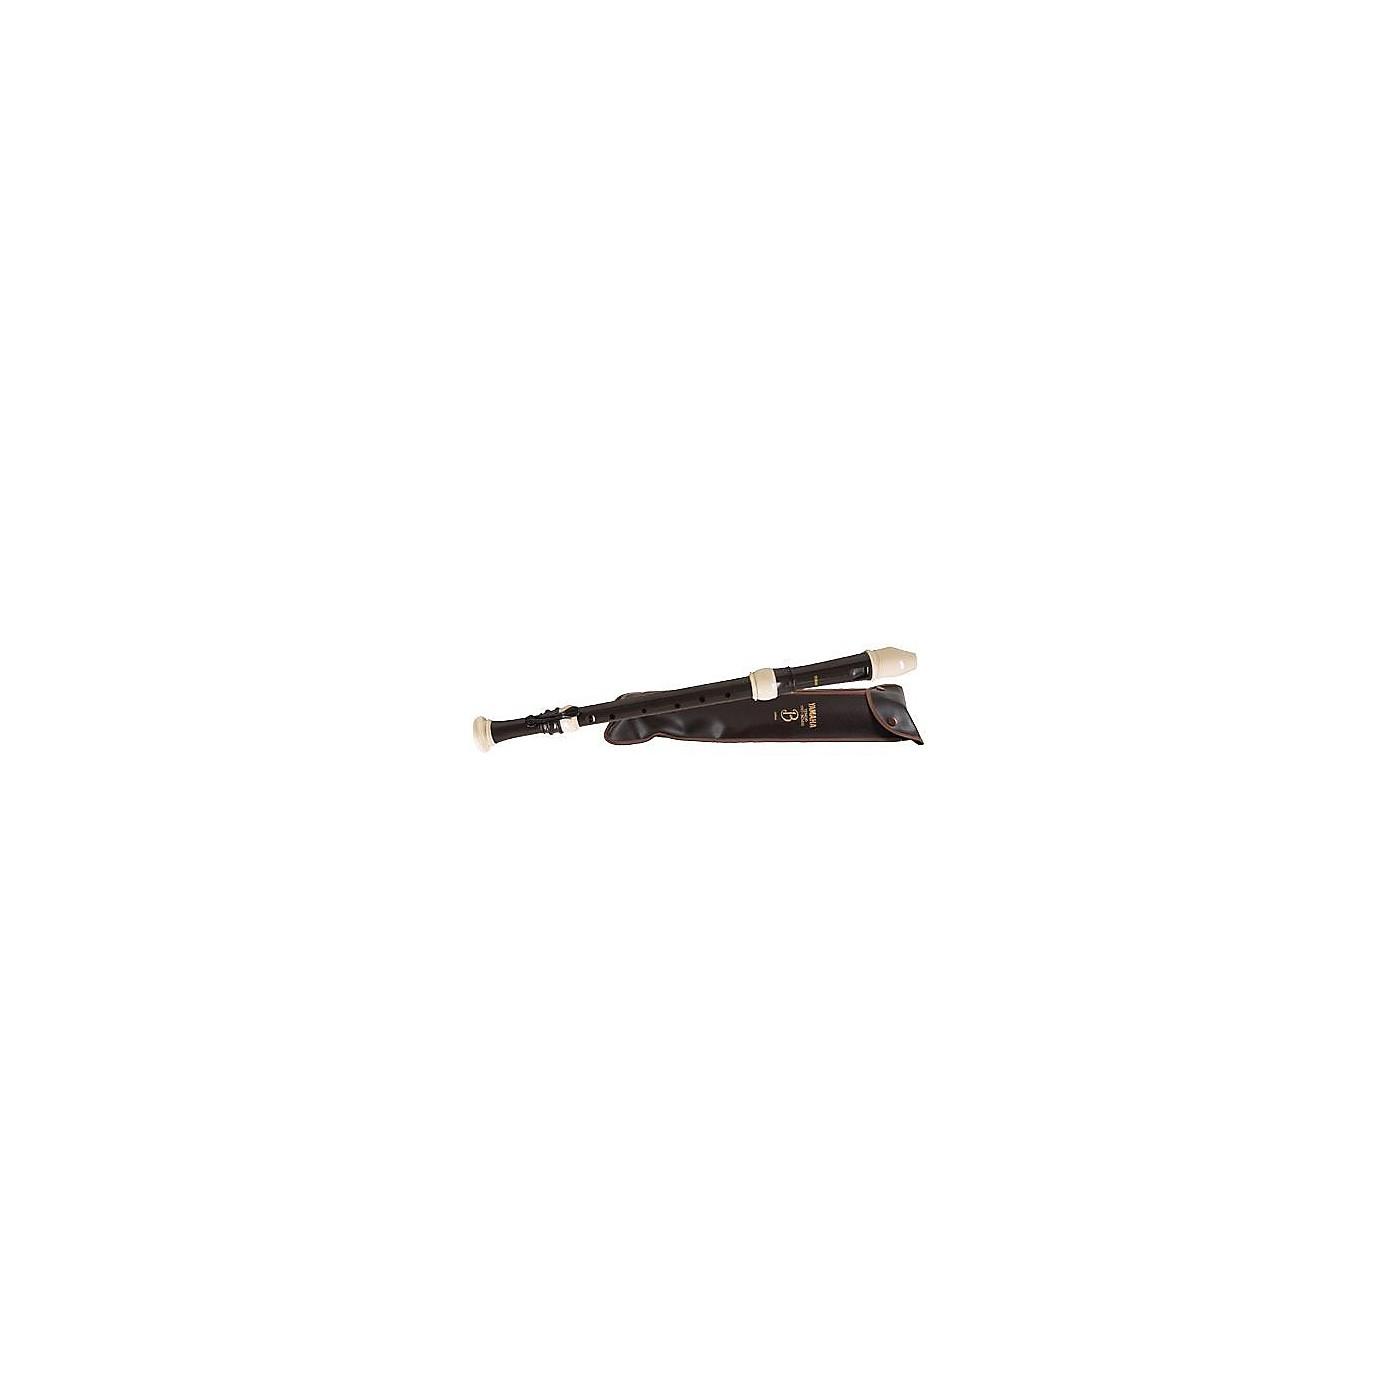 Yamaha YRT-304B Professional Tenor Recorder with Baroque Fingering thumbnail